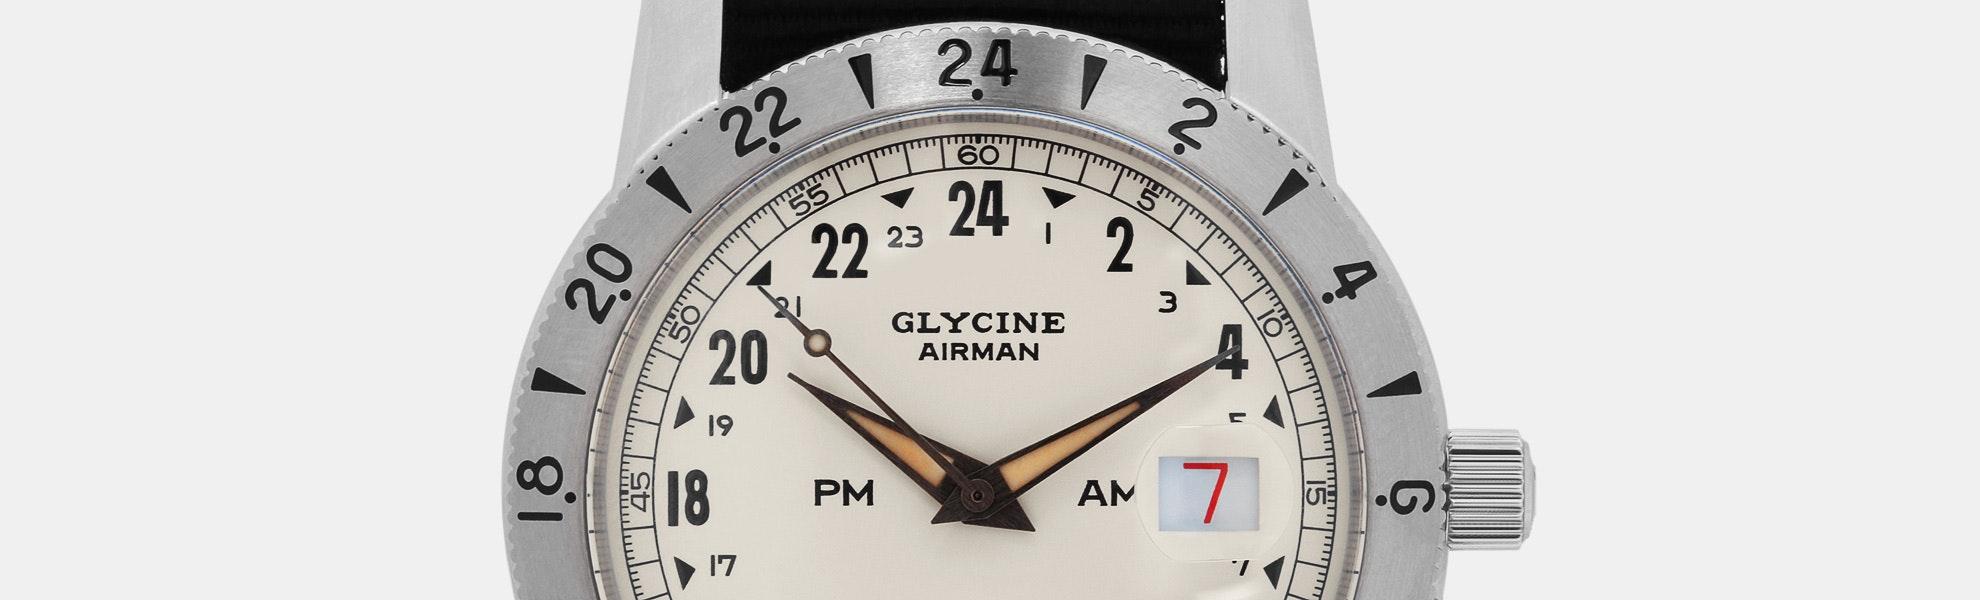 Glycine Airman Vintage 1953 – Massdrop Exclusive